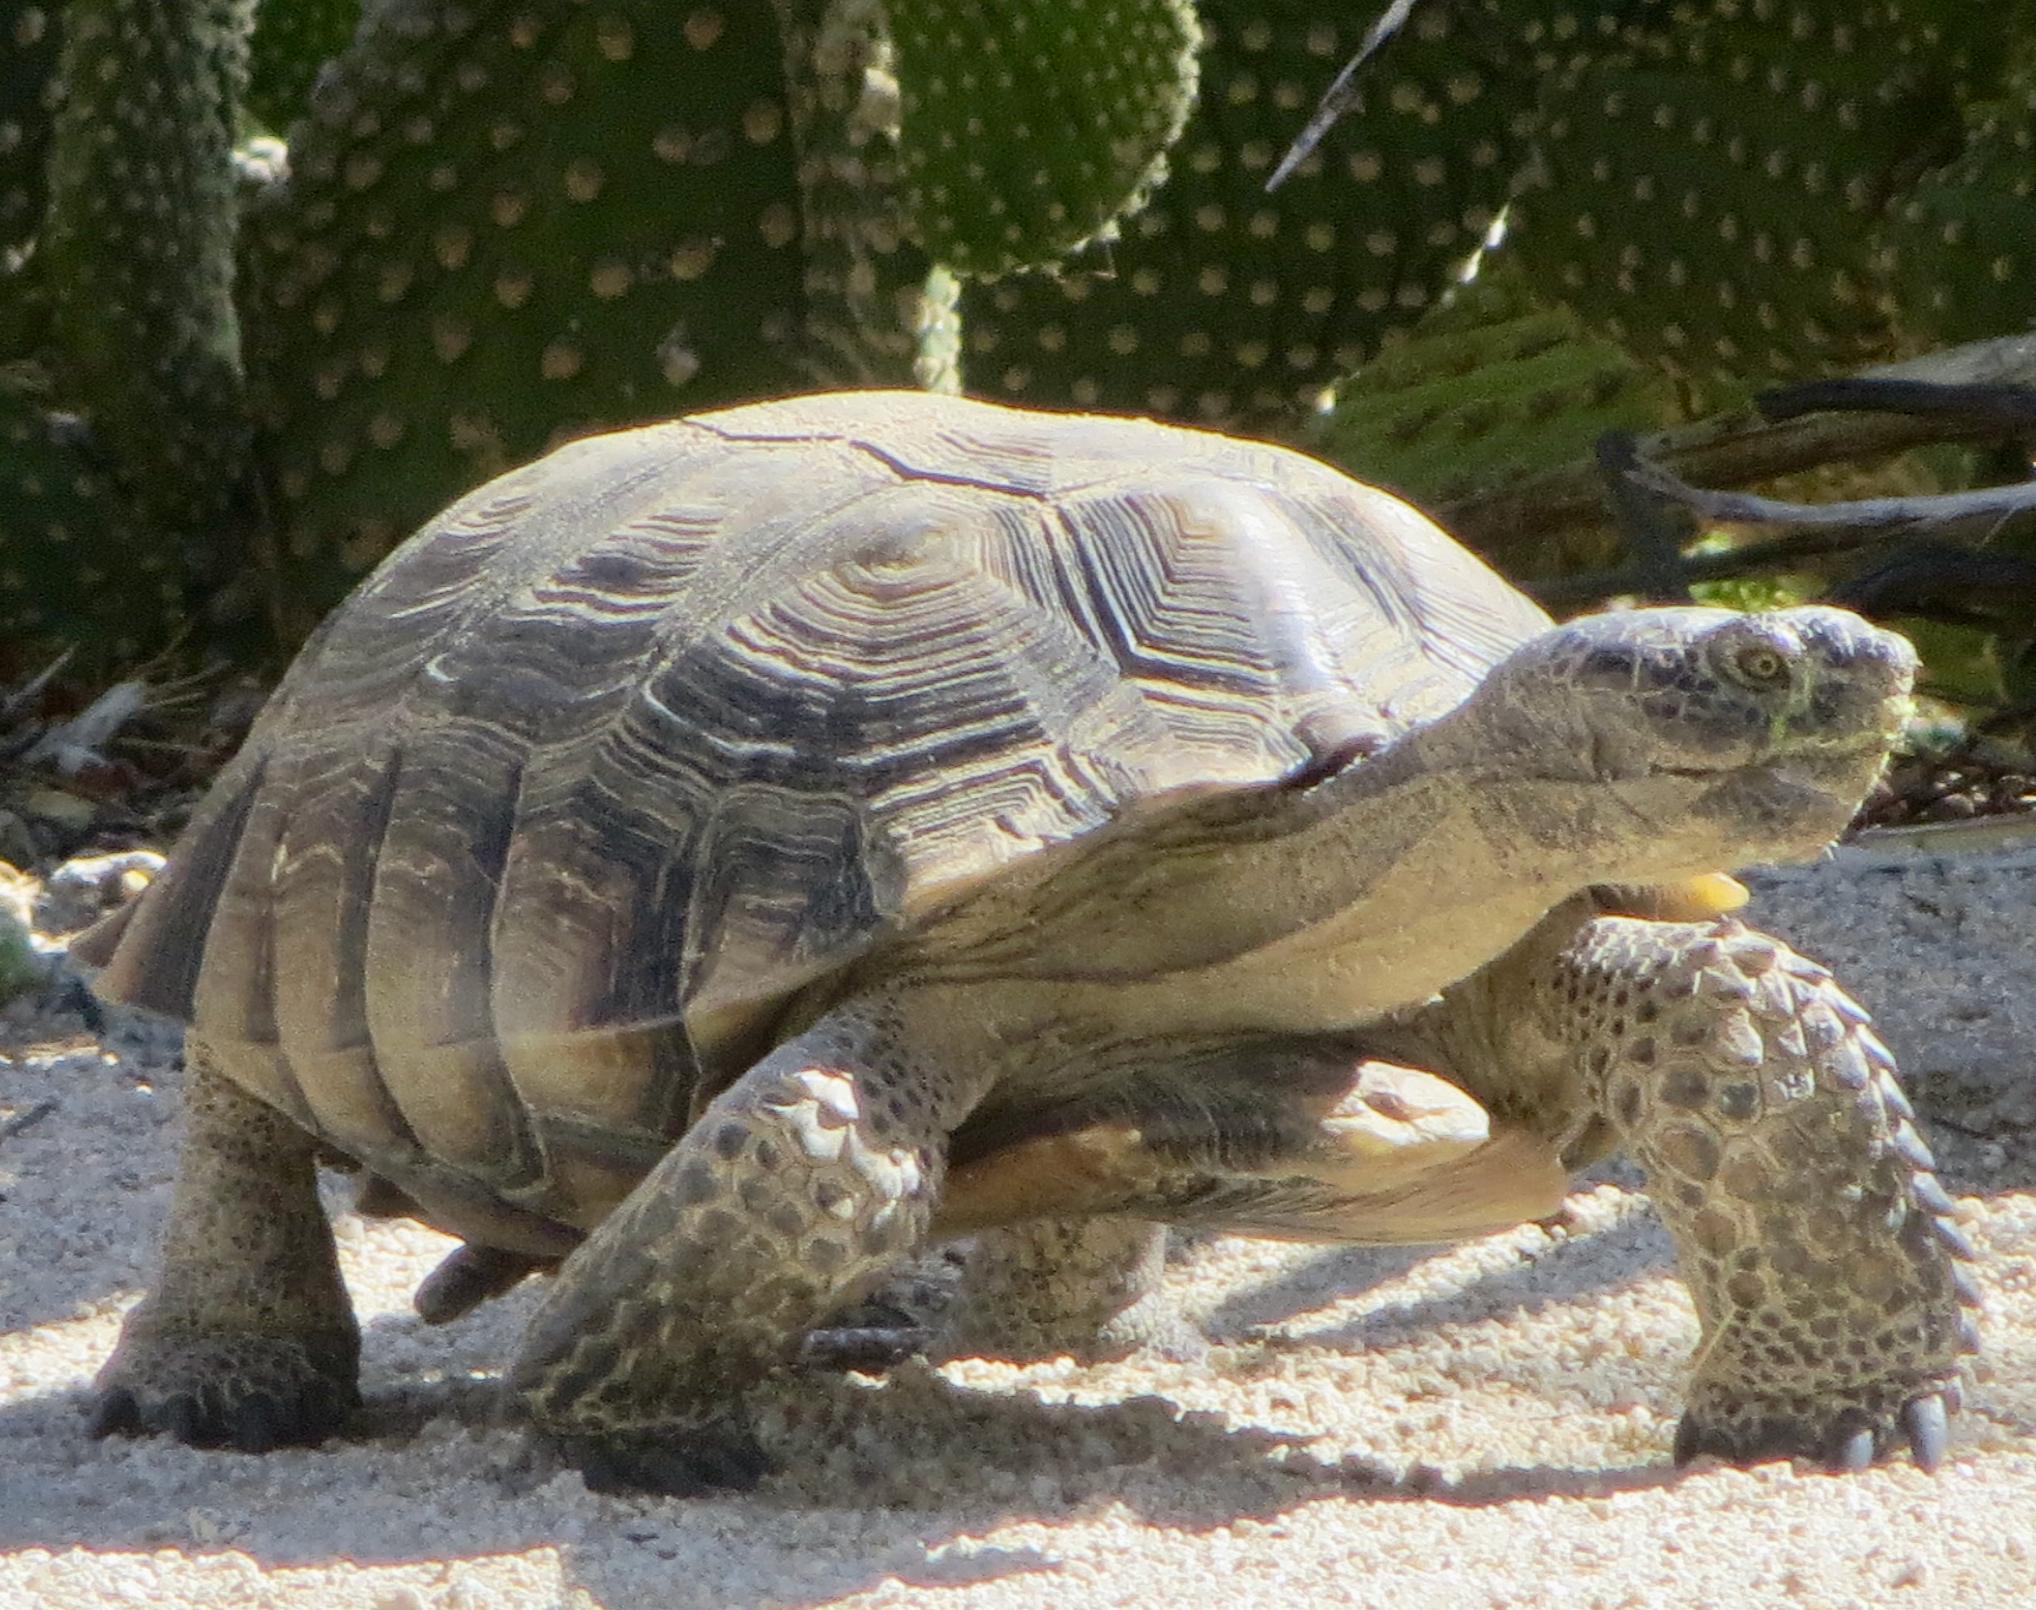 tortoise_in_yard2.jpeg